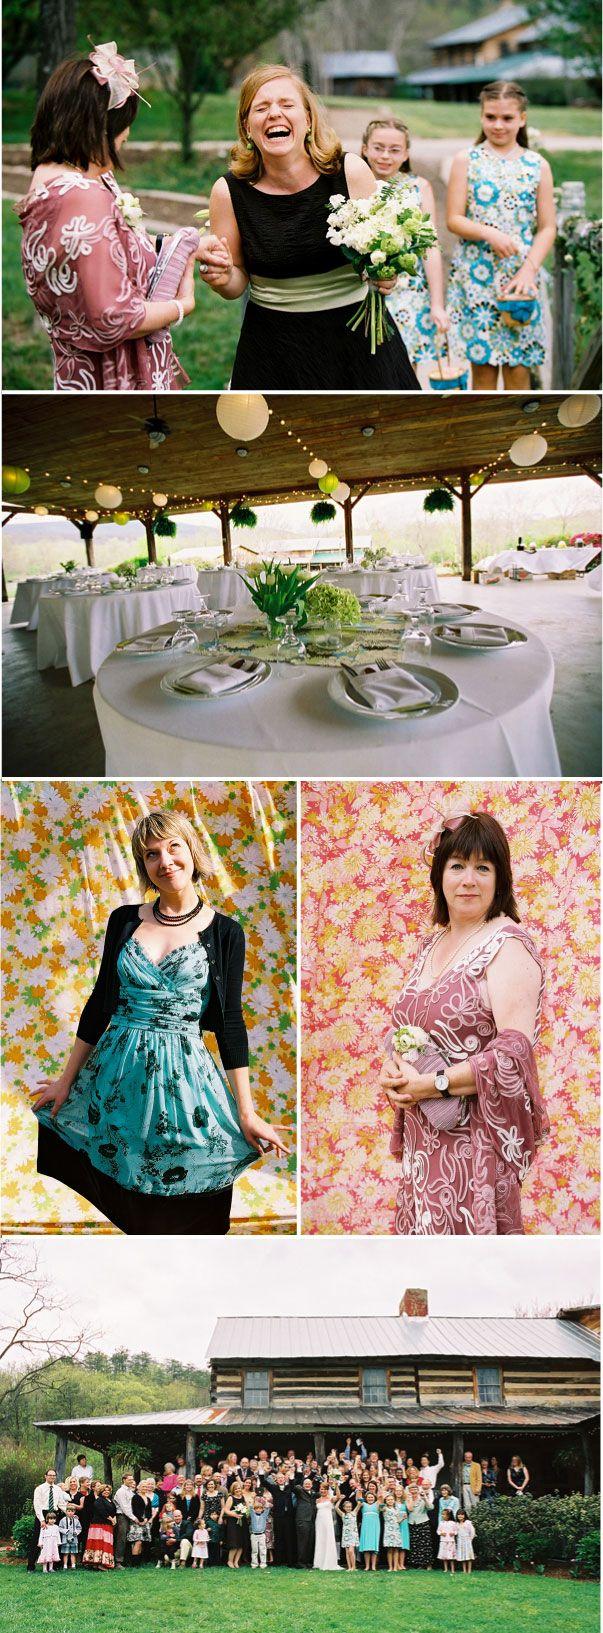 Real Wedding by Jen Fariello